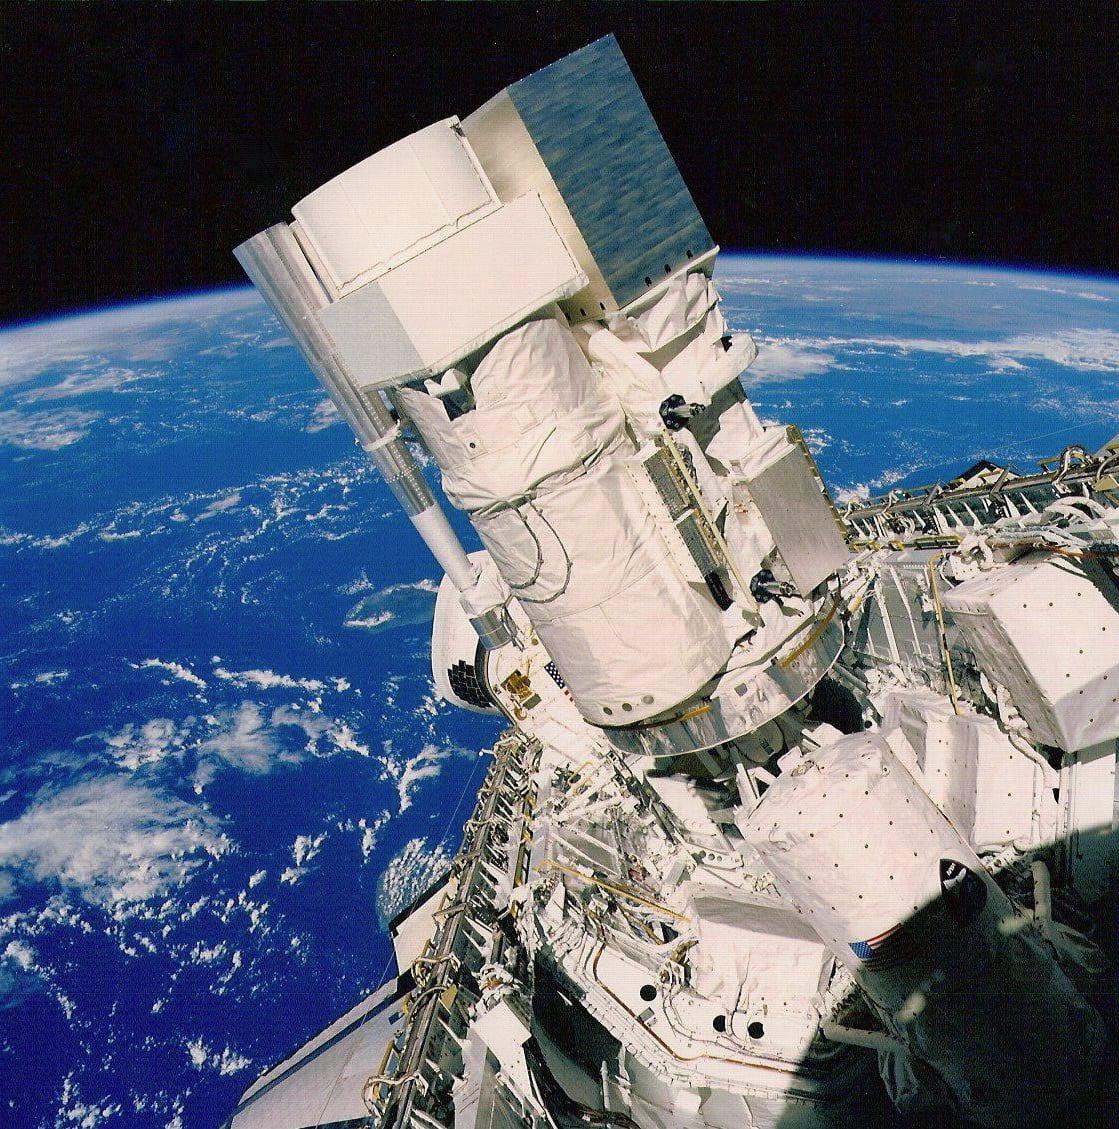 Celebrating the 30th Anniversary of Astro-1